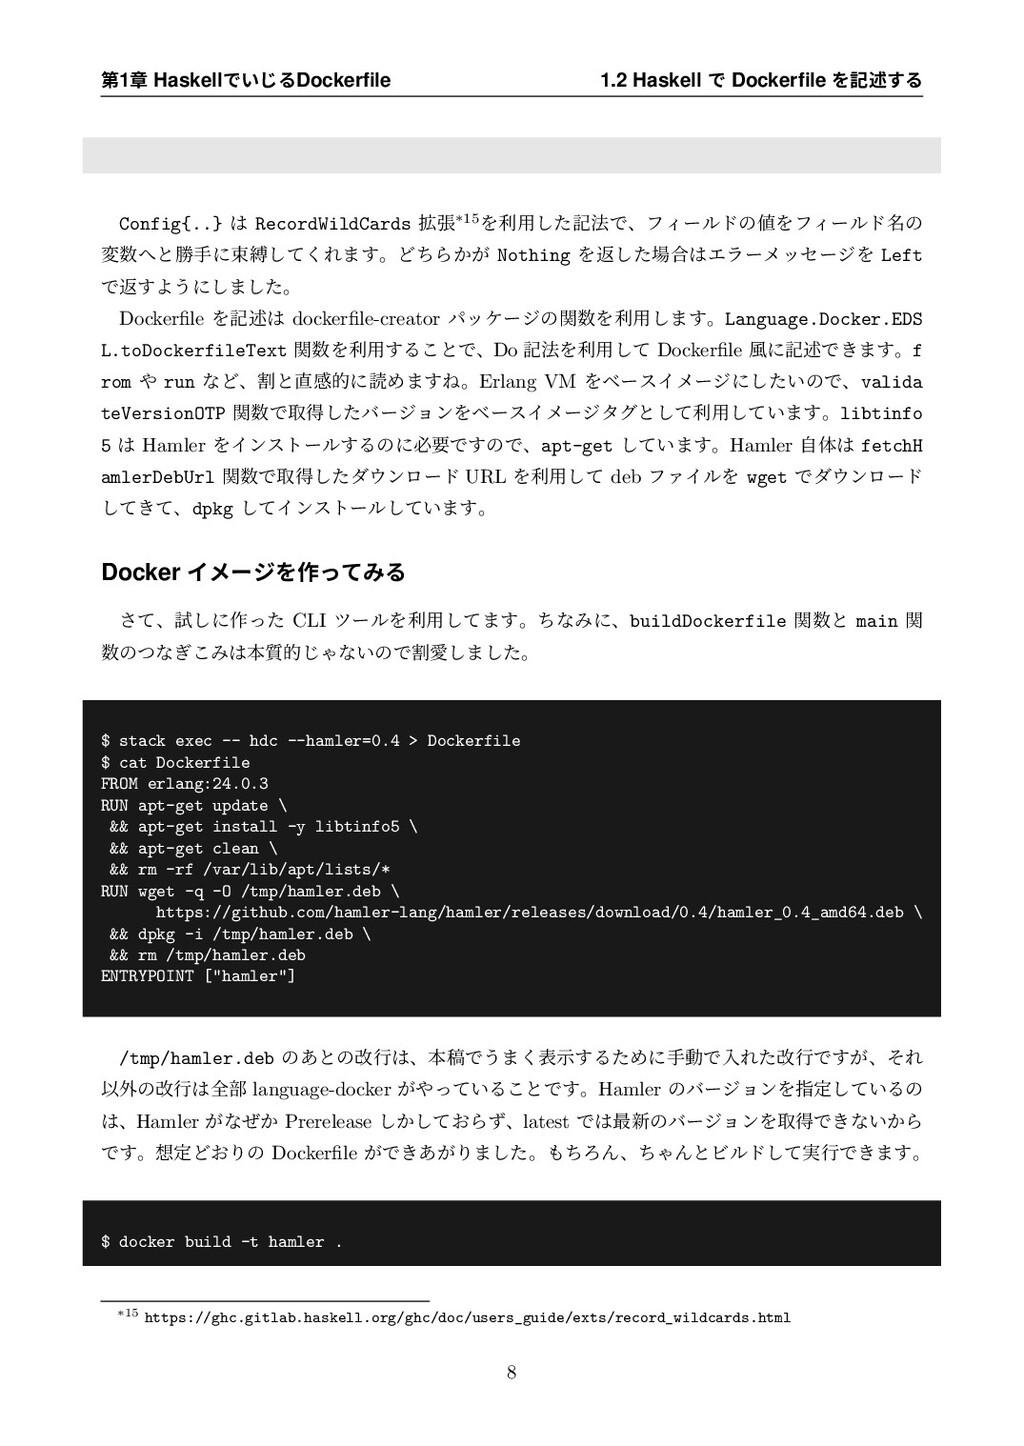 ୈ1ষ HaskellͰ͍͡ΔDockerfile 1.2 Haskell Ͱ Dockerfil...